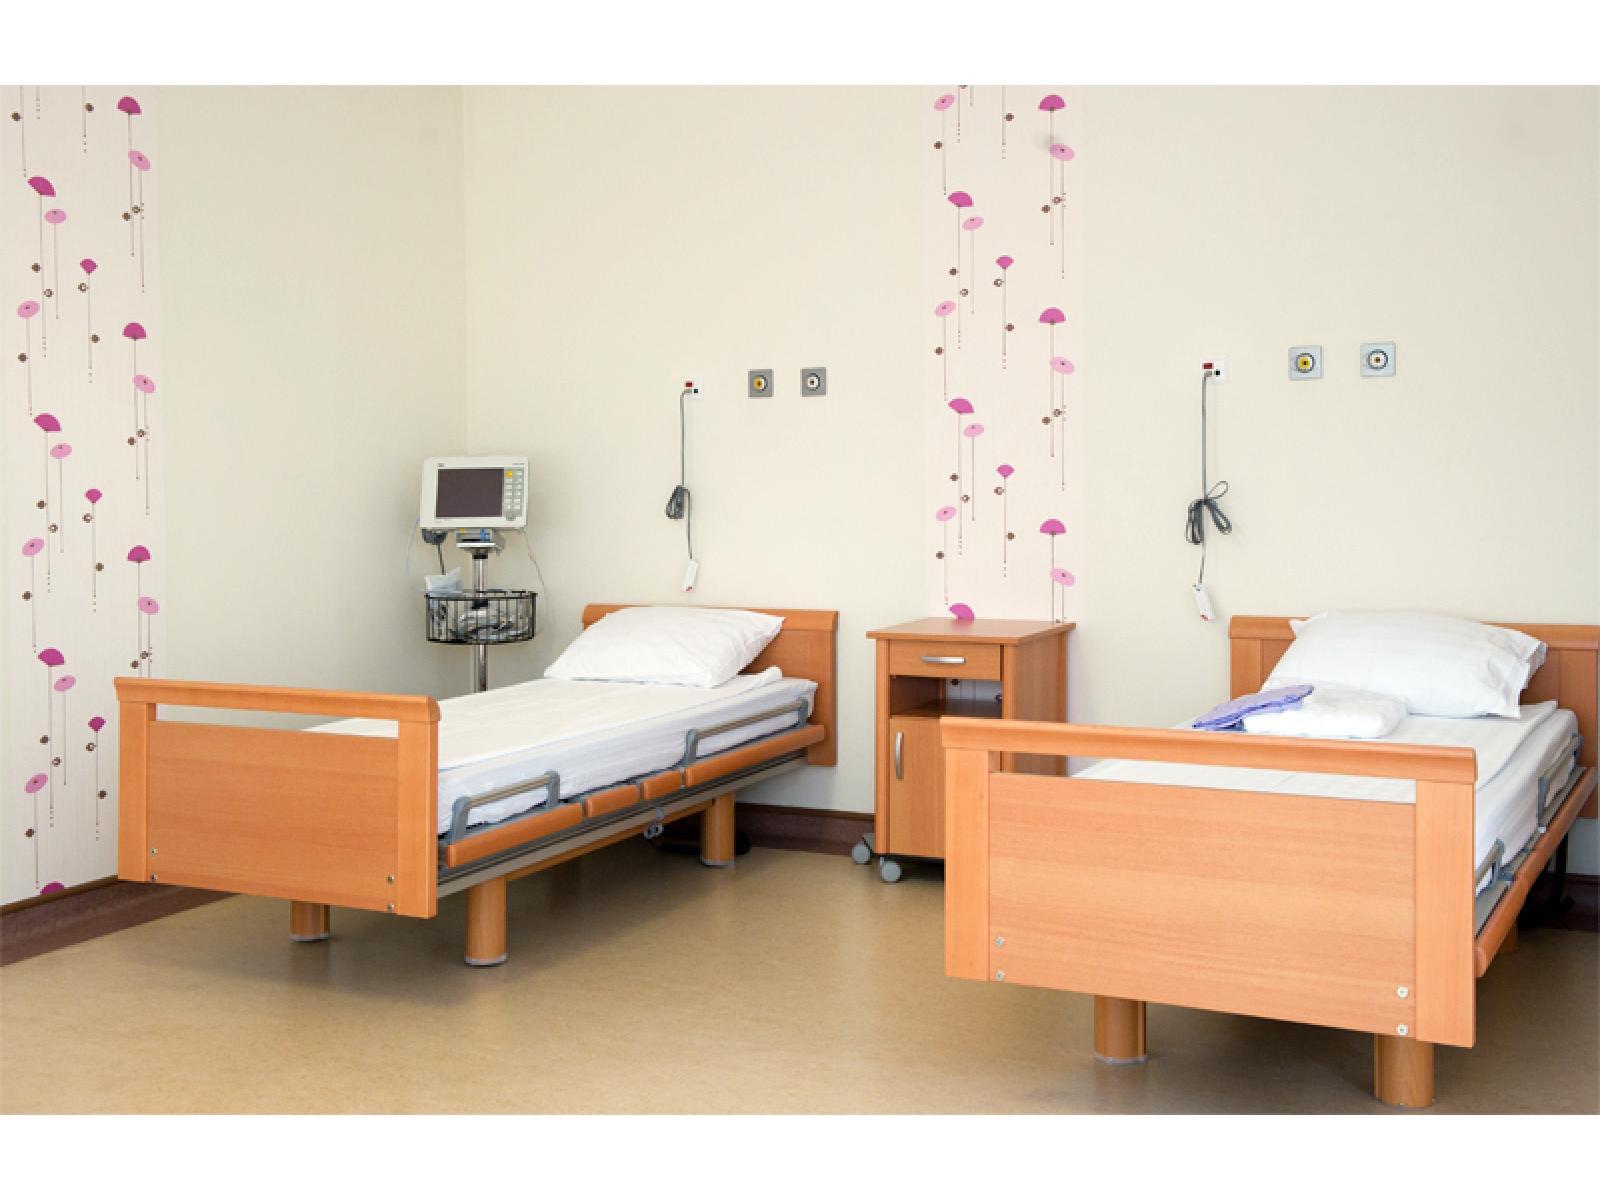 Arcadia Spitale si Centre Medicale - NGM_5565.jpg